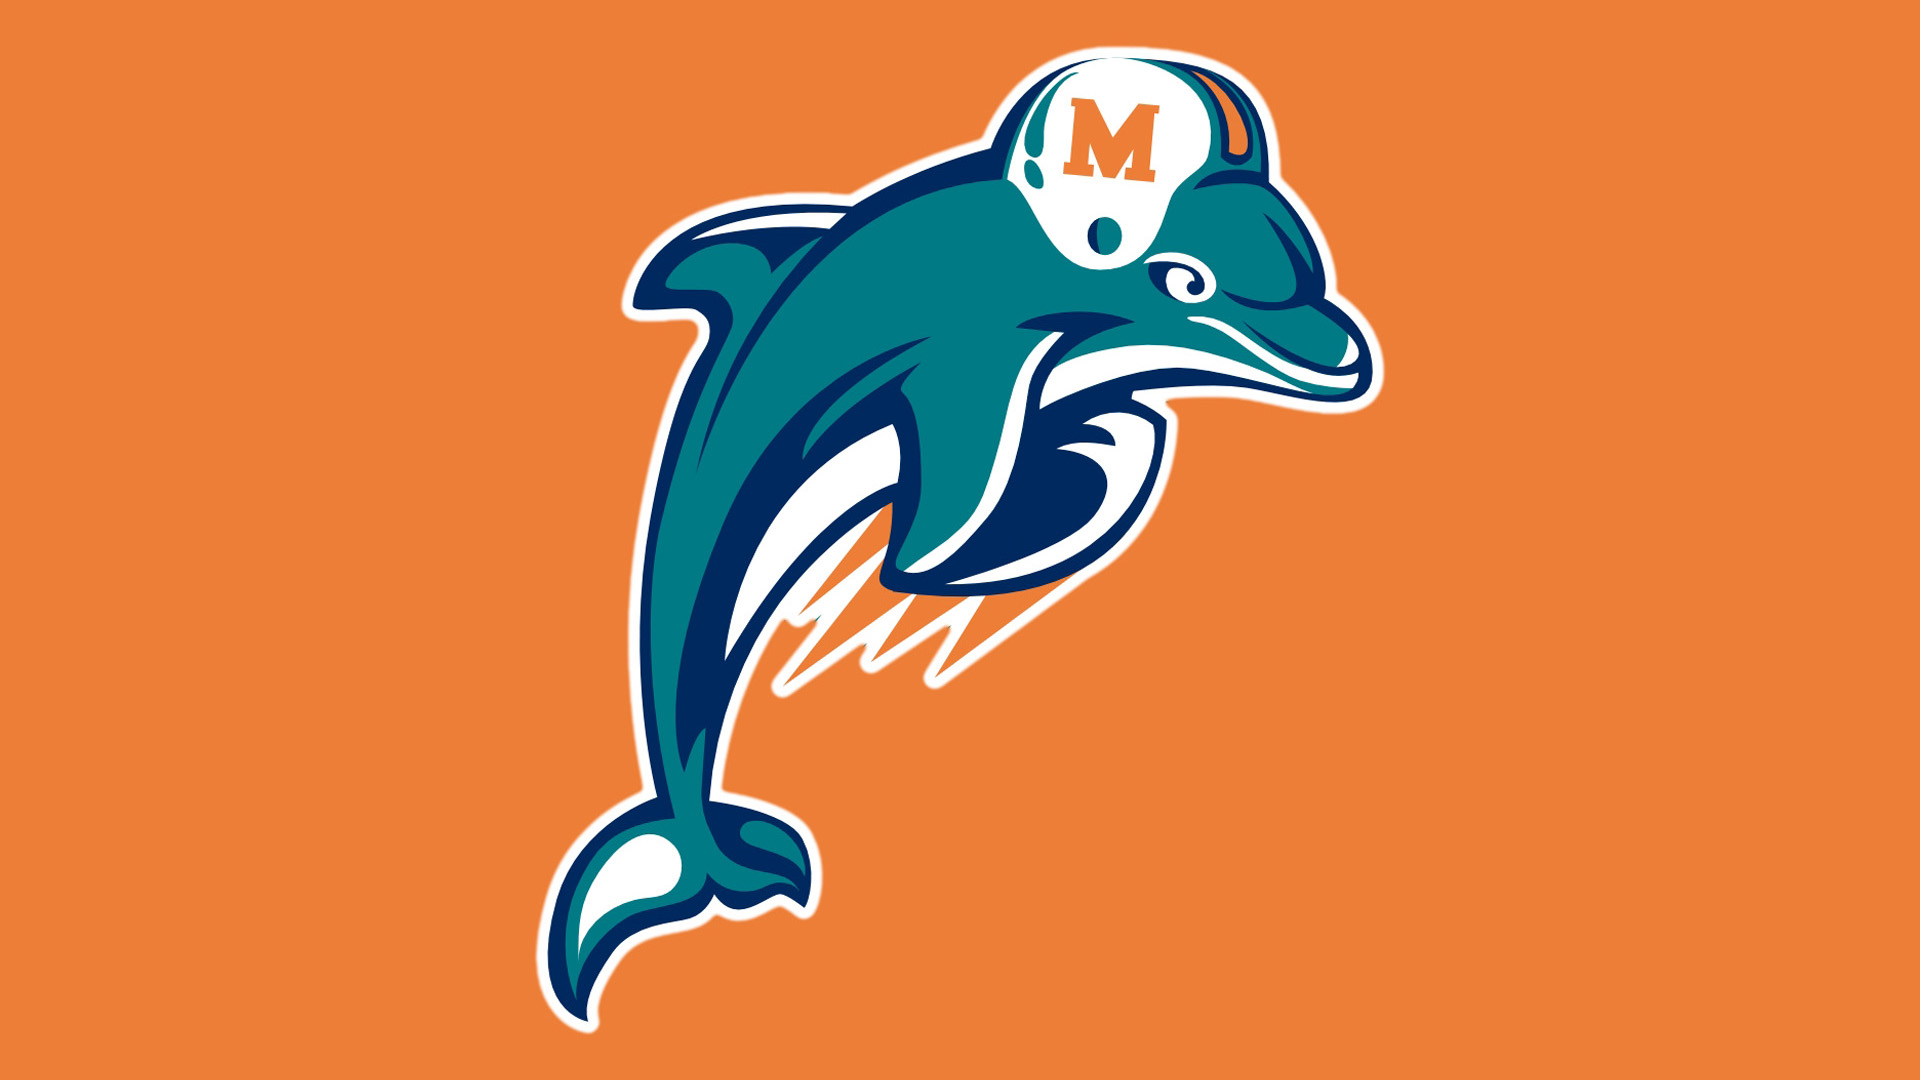 Miami Dolphins good background